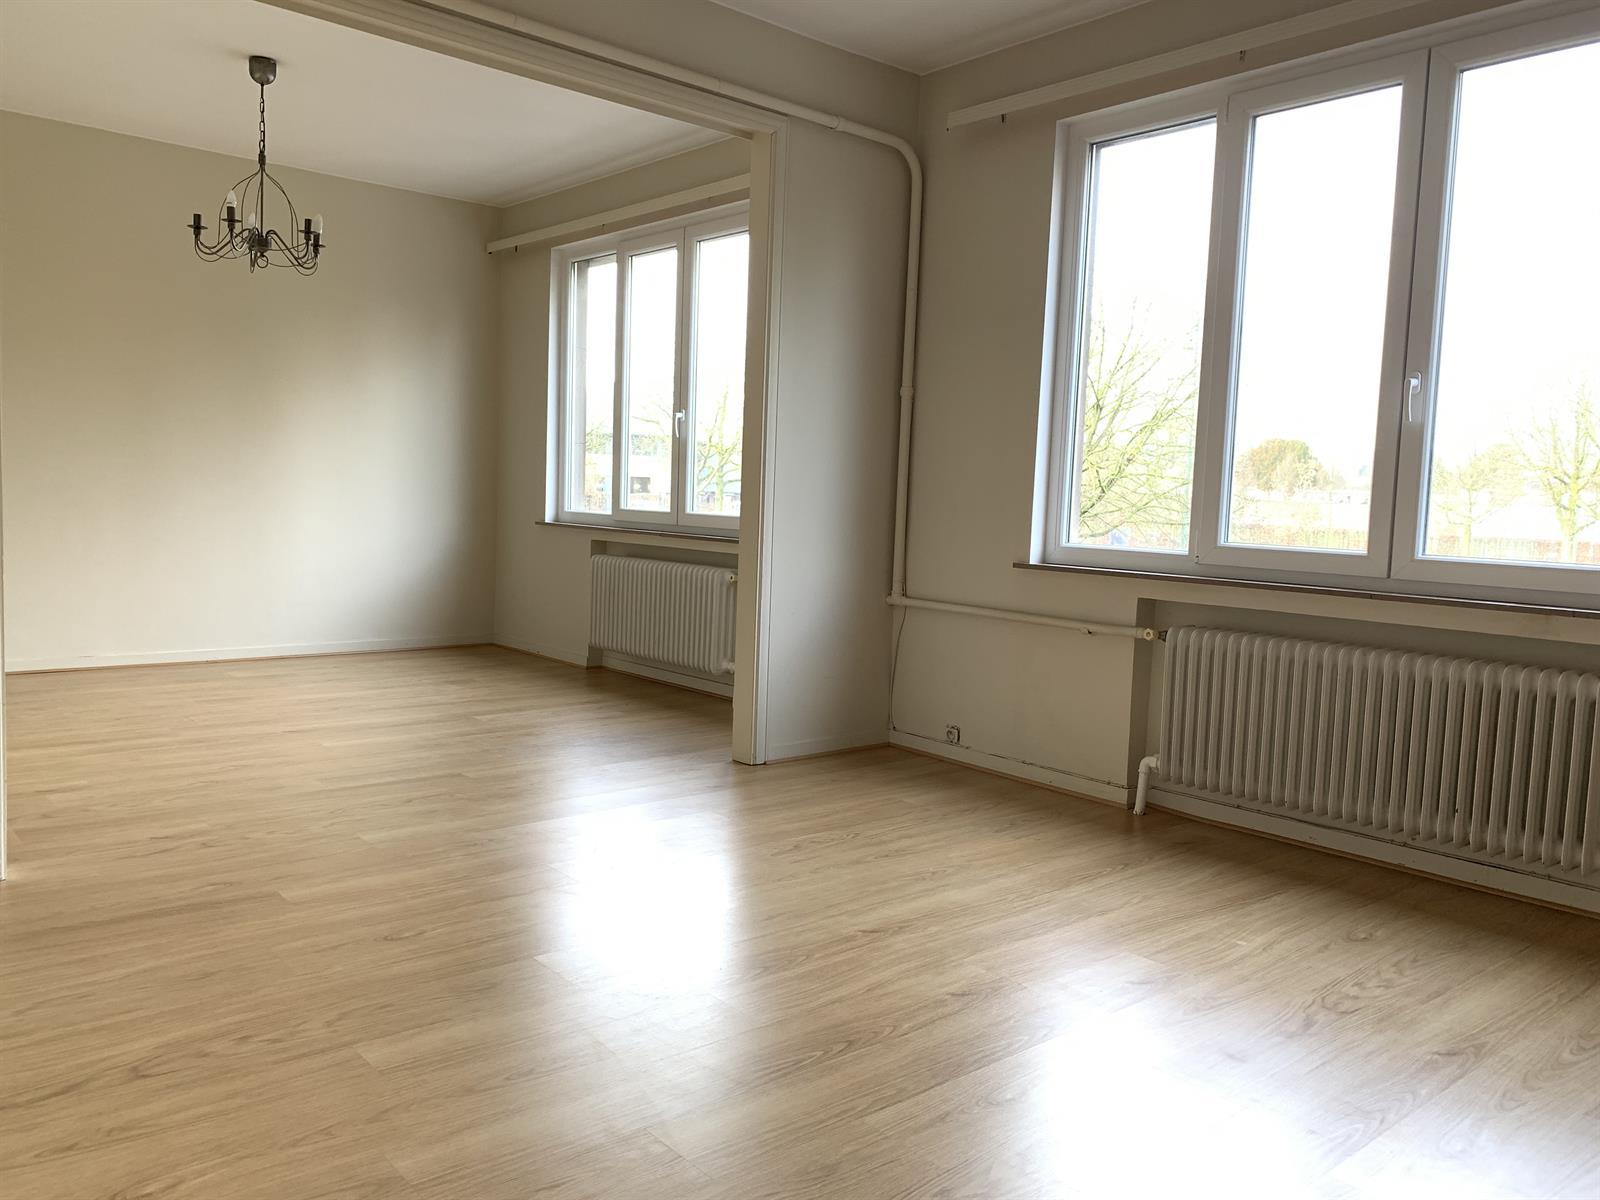 Flat - Molenbeek-Saint-Jean - #3956375-13